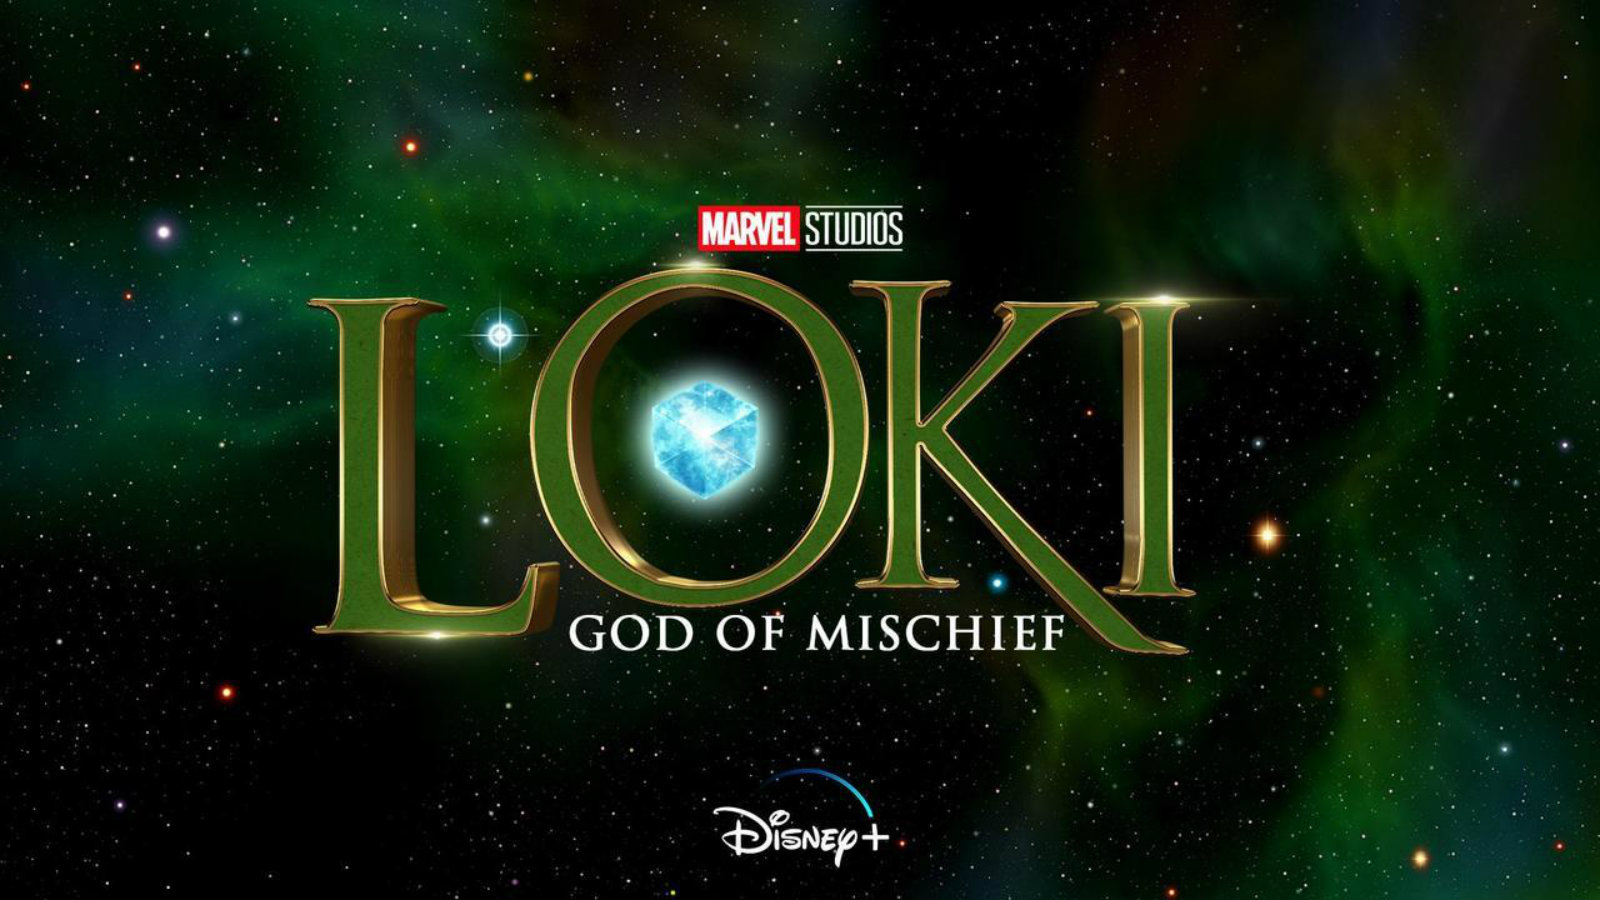 Loki -God of Mischief